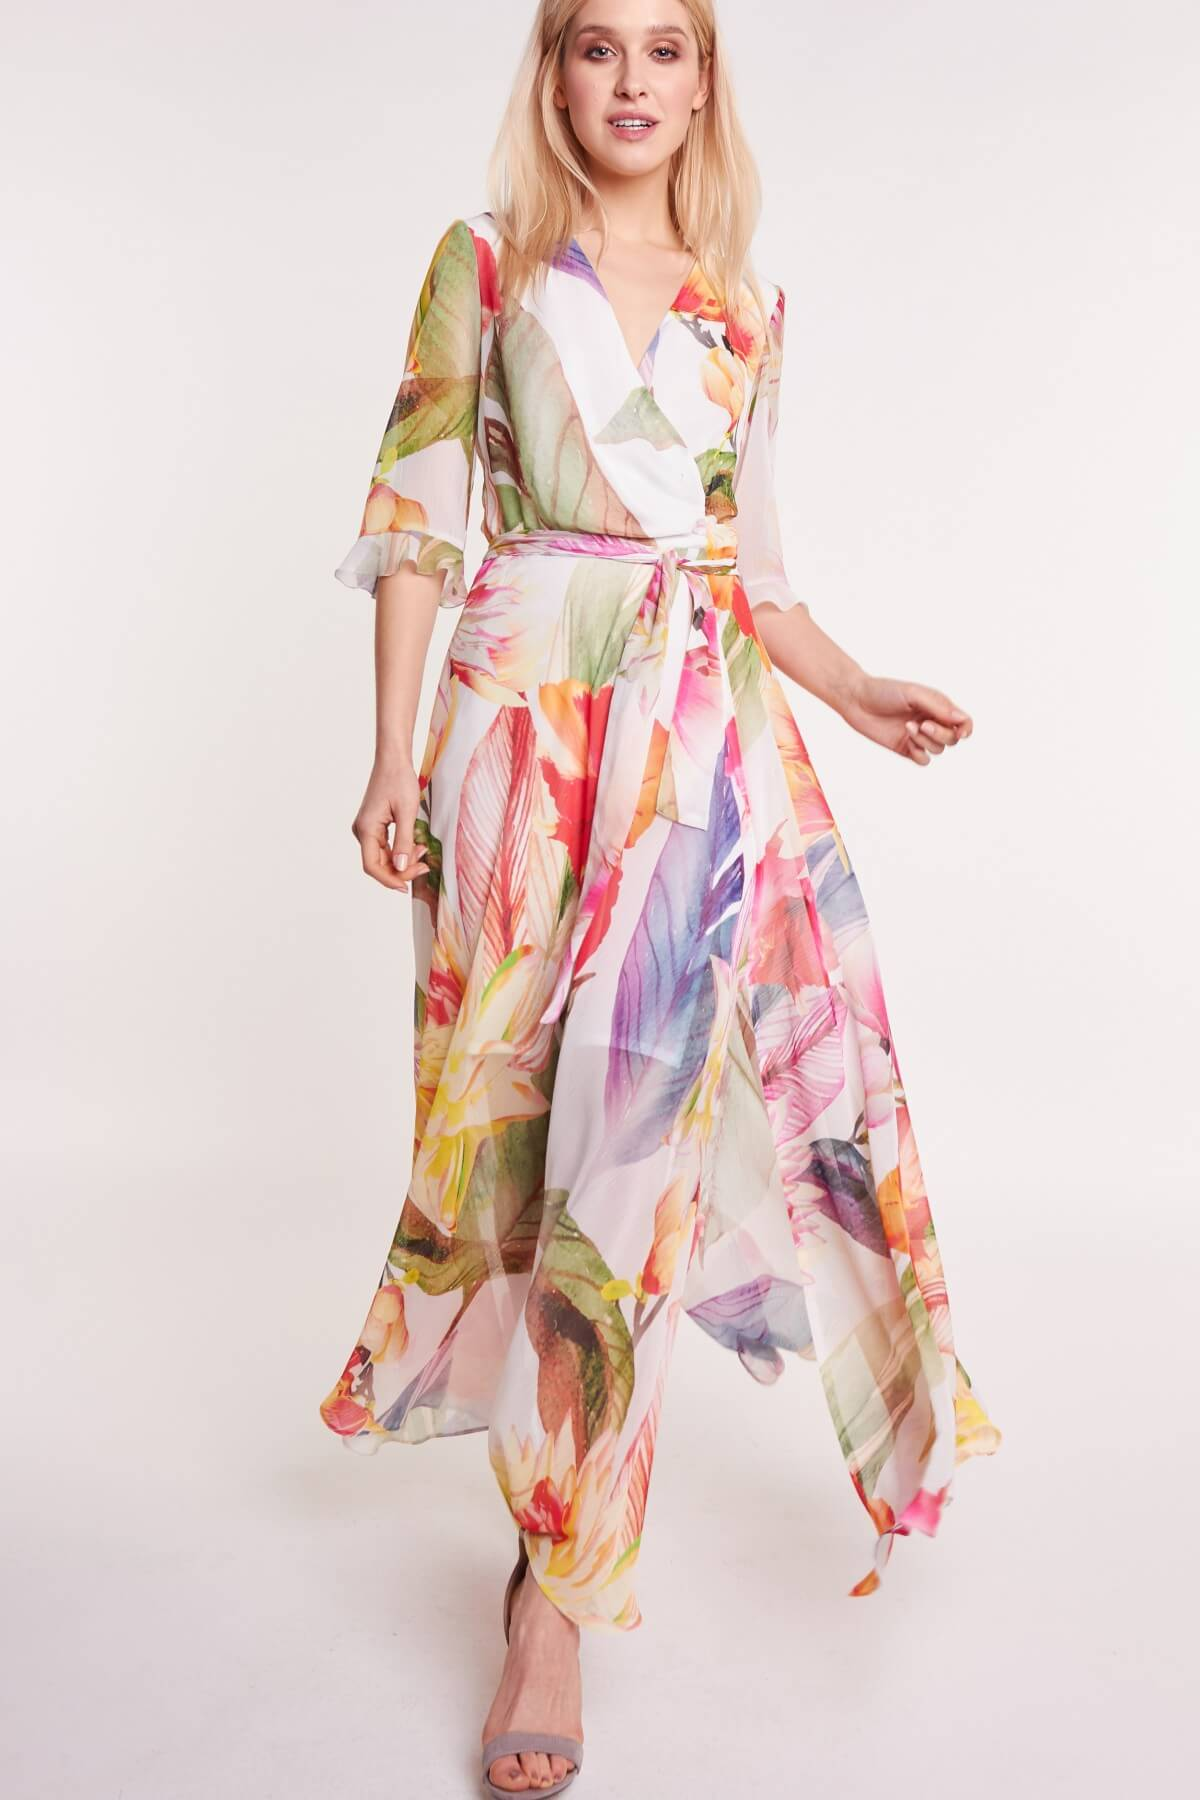 d52ce7fcff Sukienki maxi – jak je nosić  - Blog o modzie